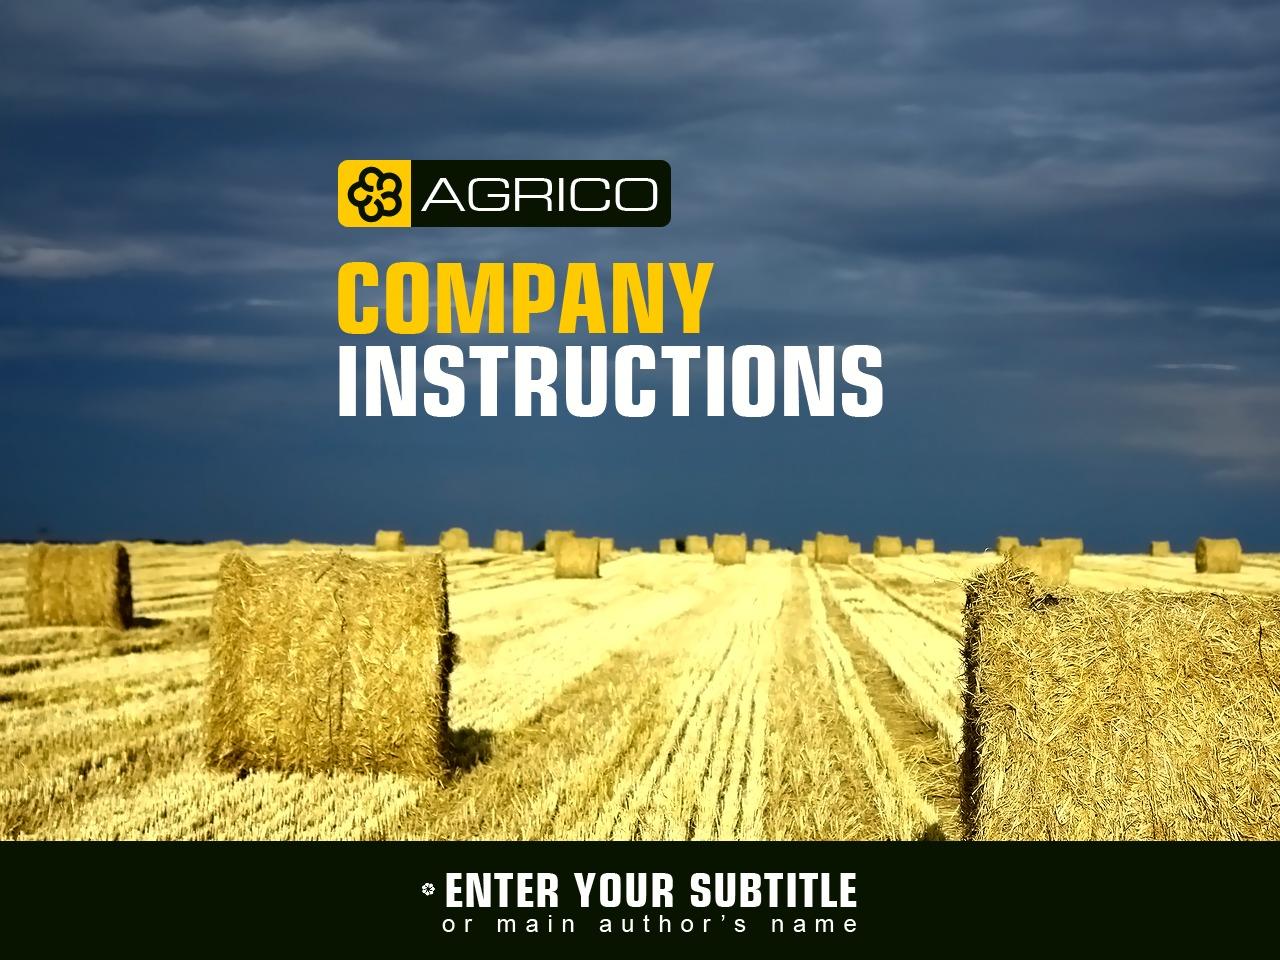 Szablon PowerPoint #29322 na temat: rolnictwo